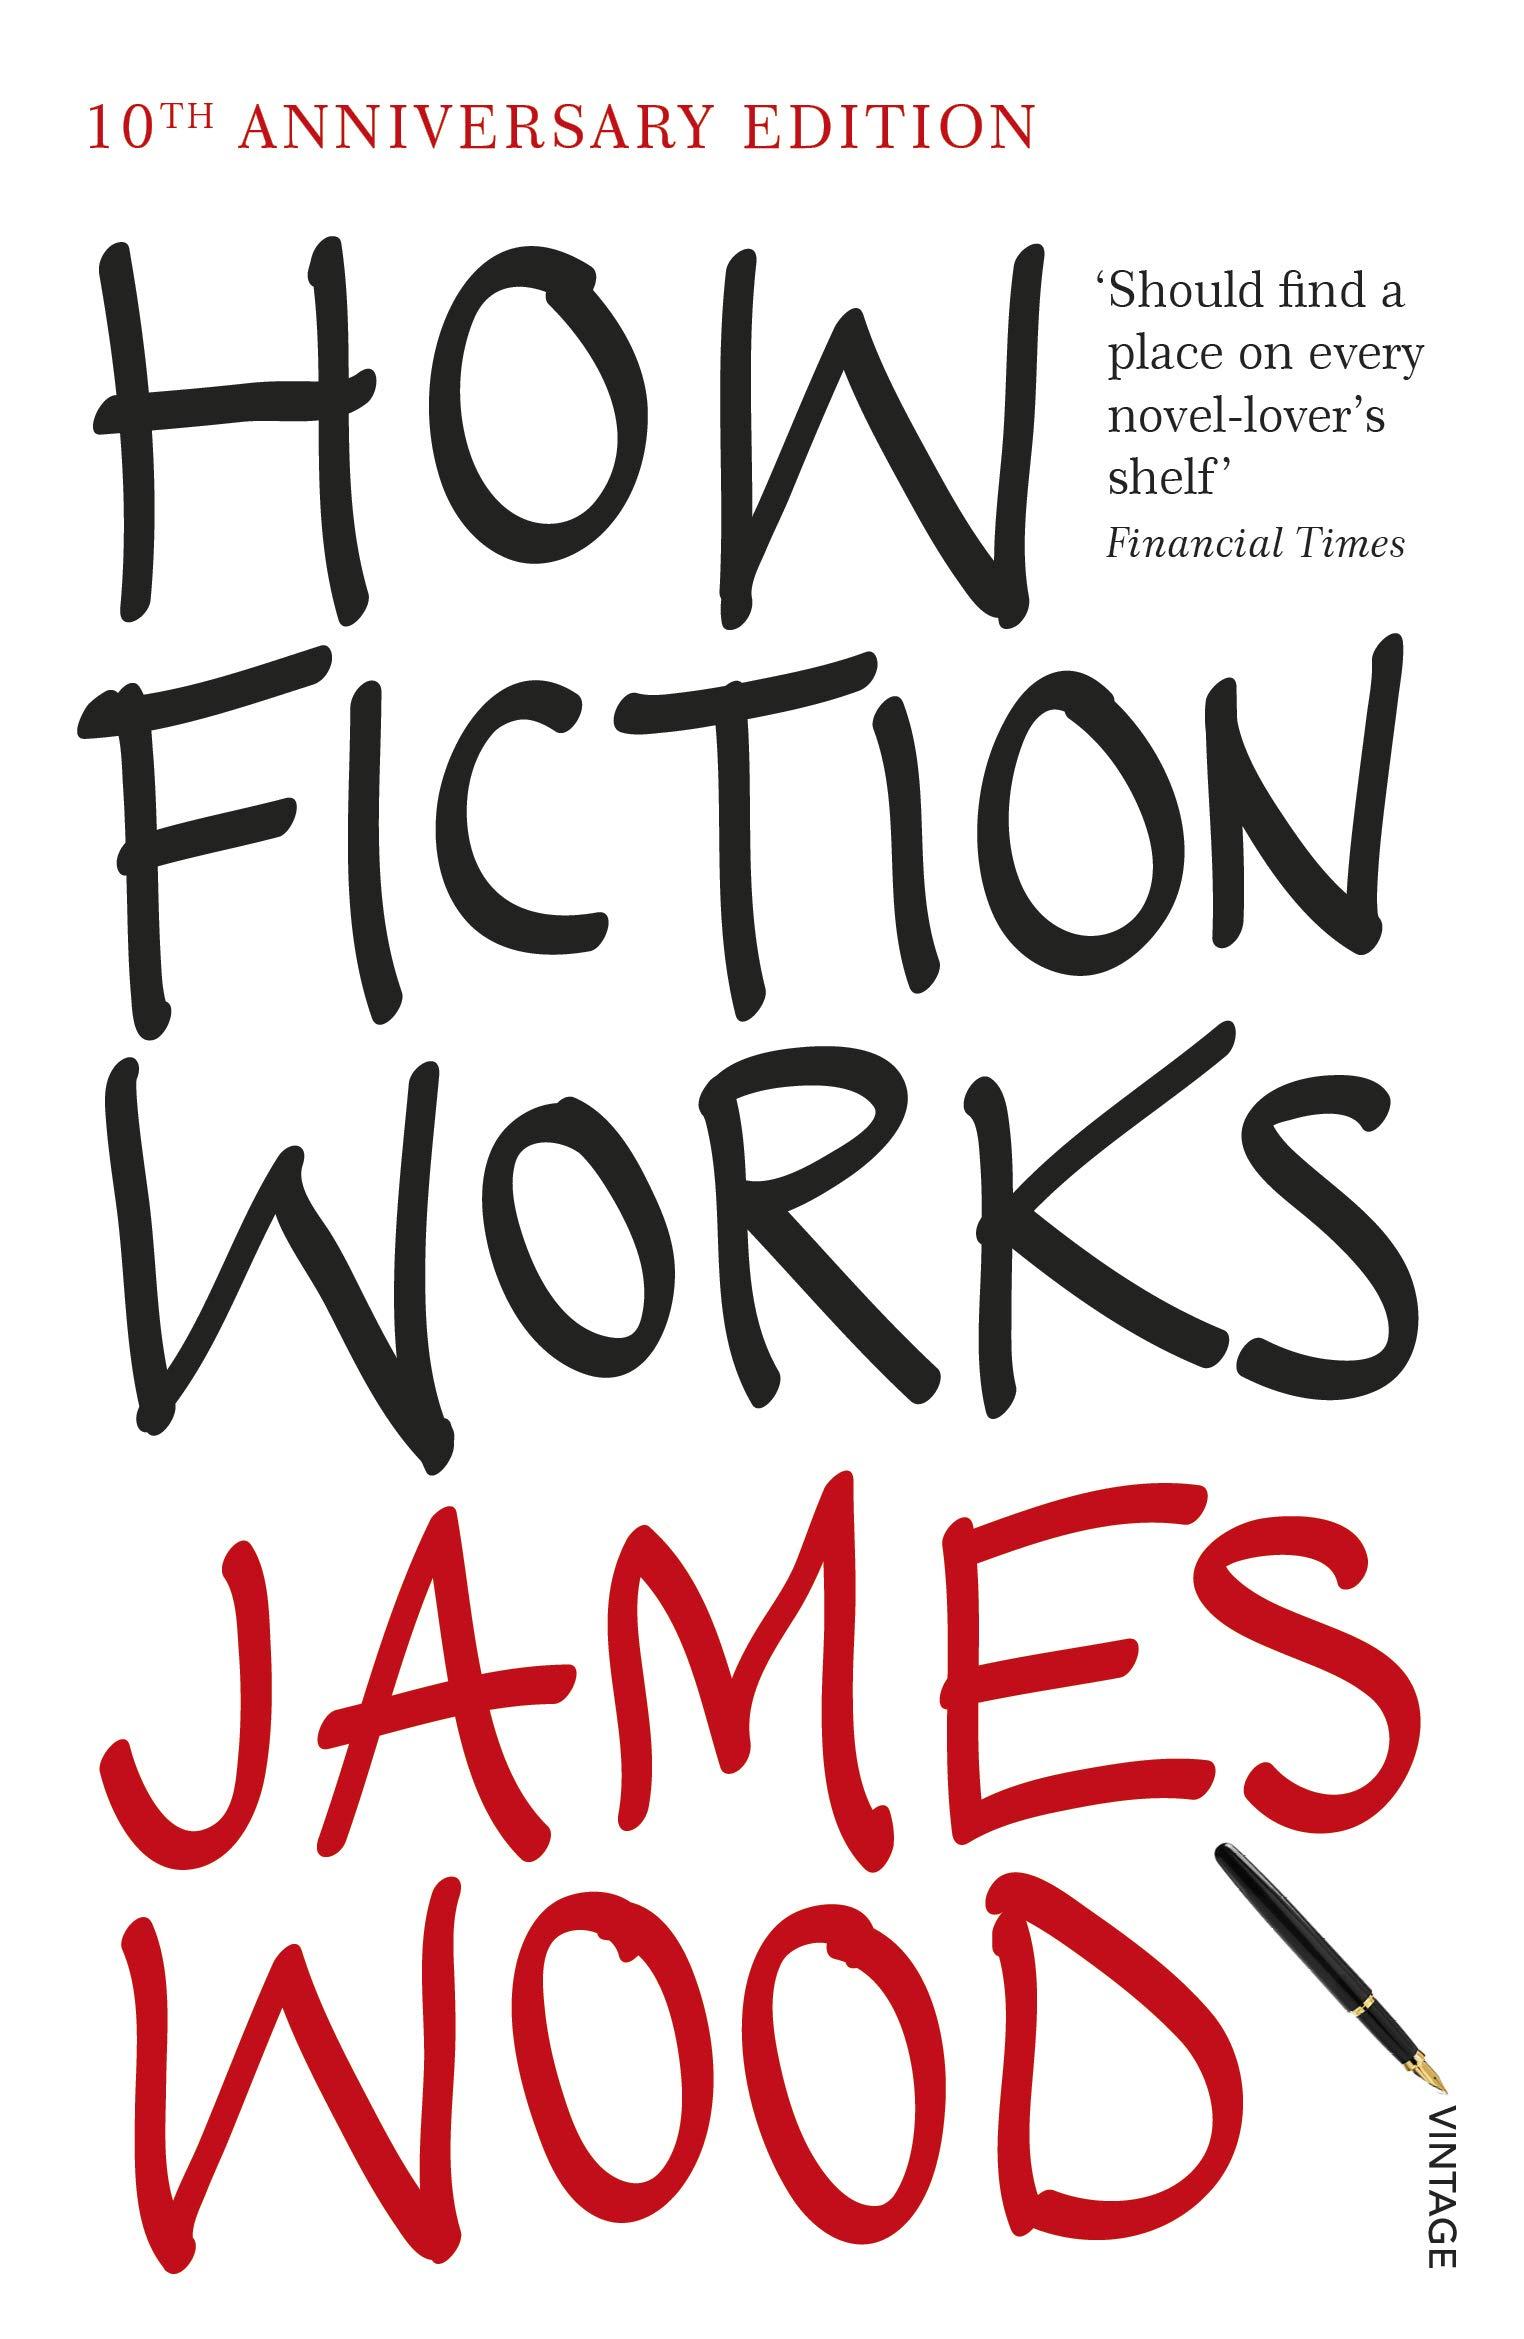 How Fiction Works: Amazon.co.uk: Wood, James: 9781845950934: Books